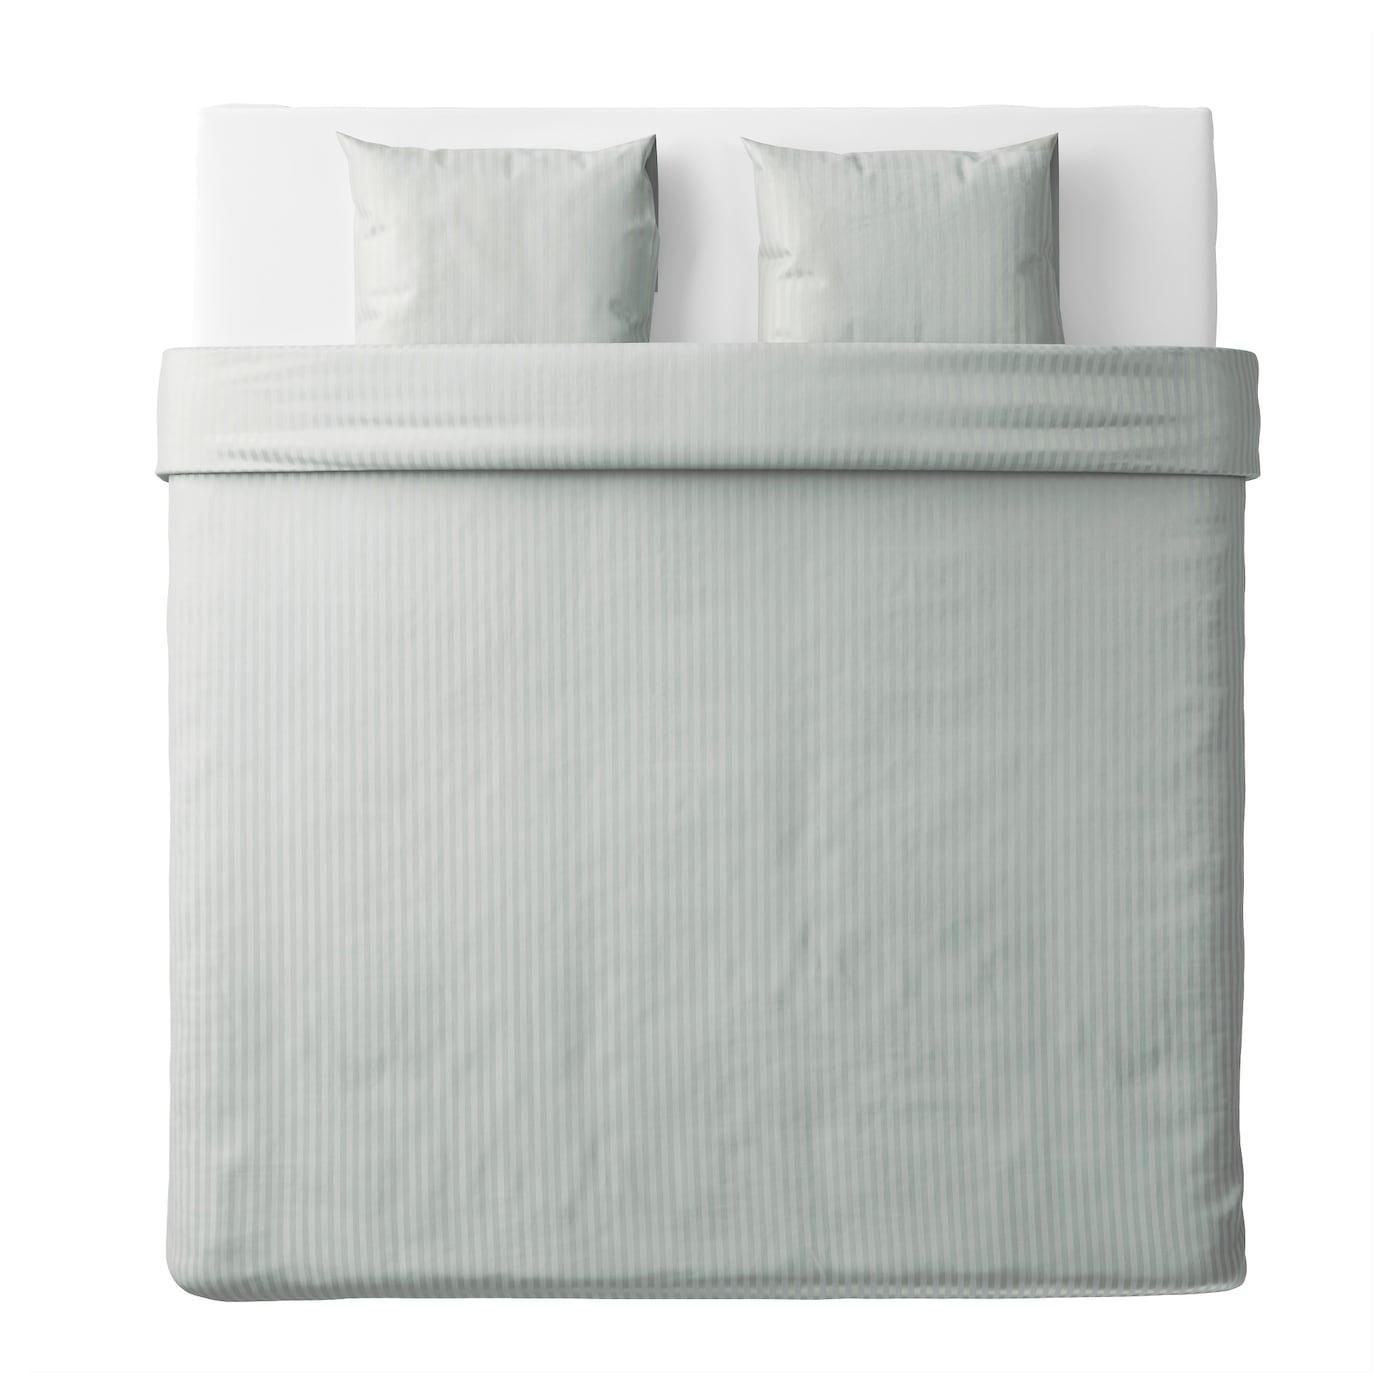 glansvide couette chaude 240 x 220 cm ikea. Black Bedroom Furniture Sets. Home Design Ideas